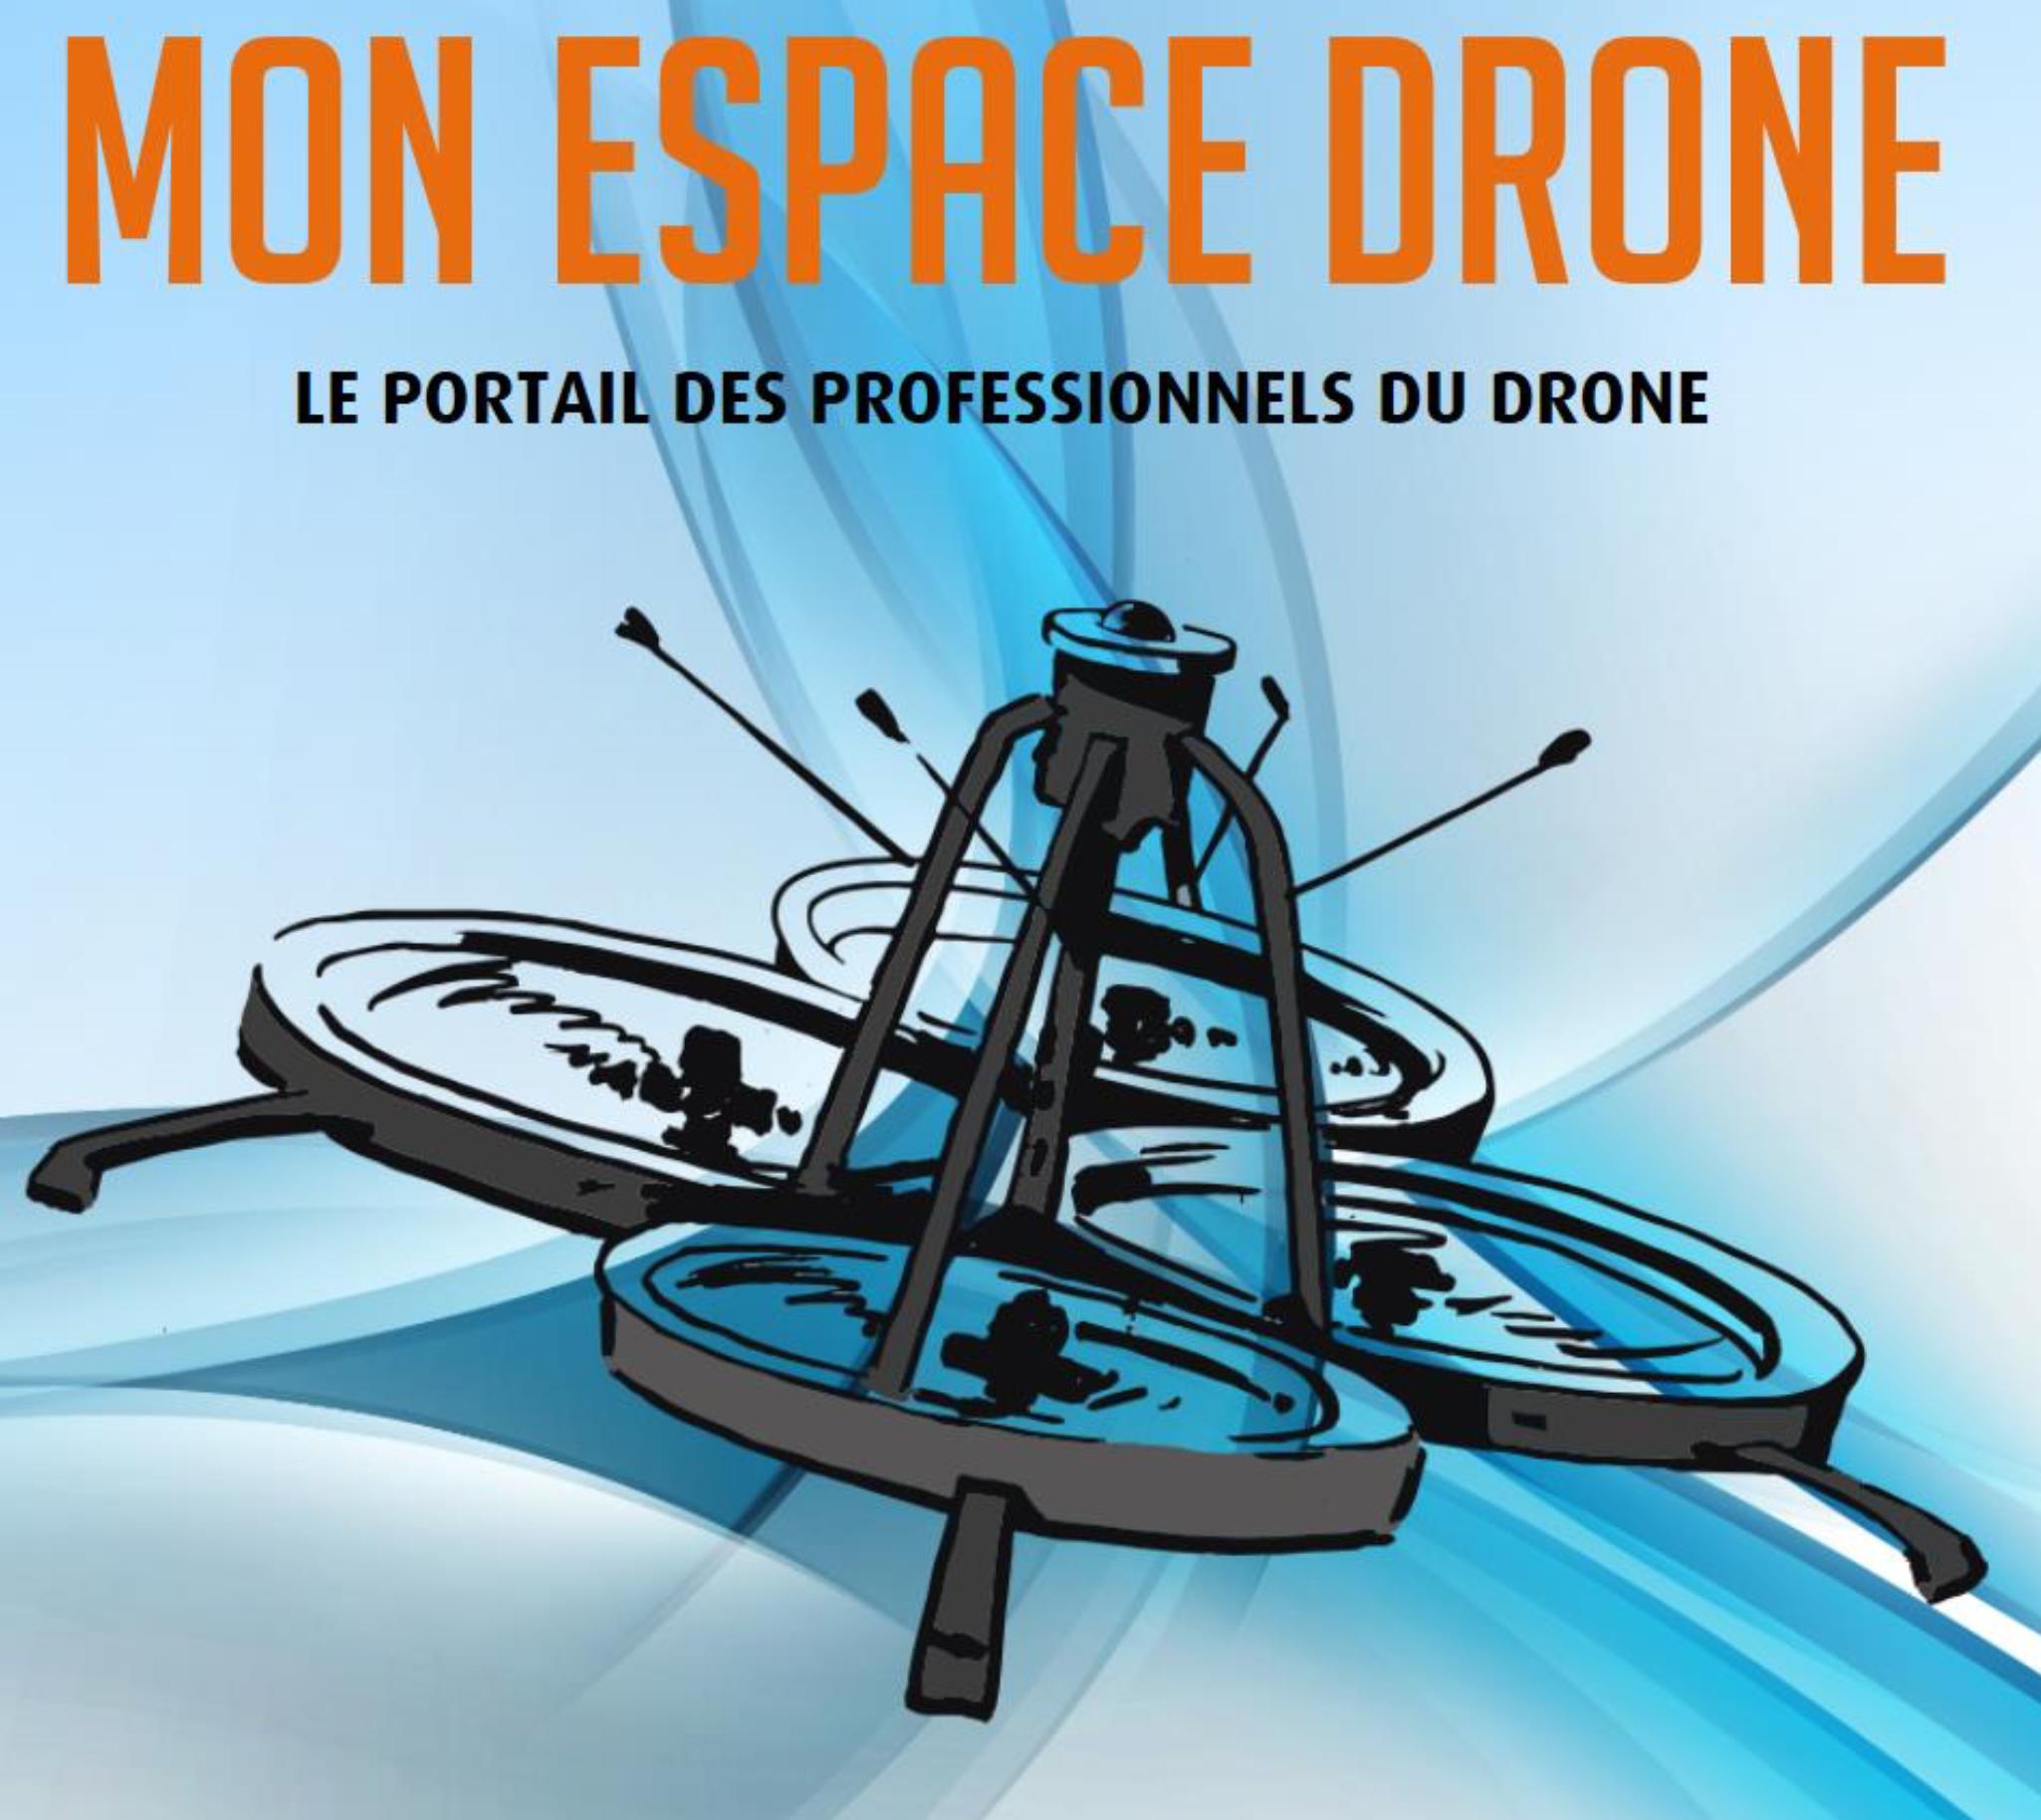 drone spider